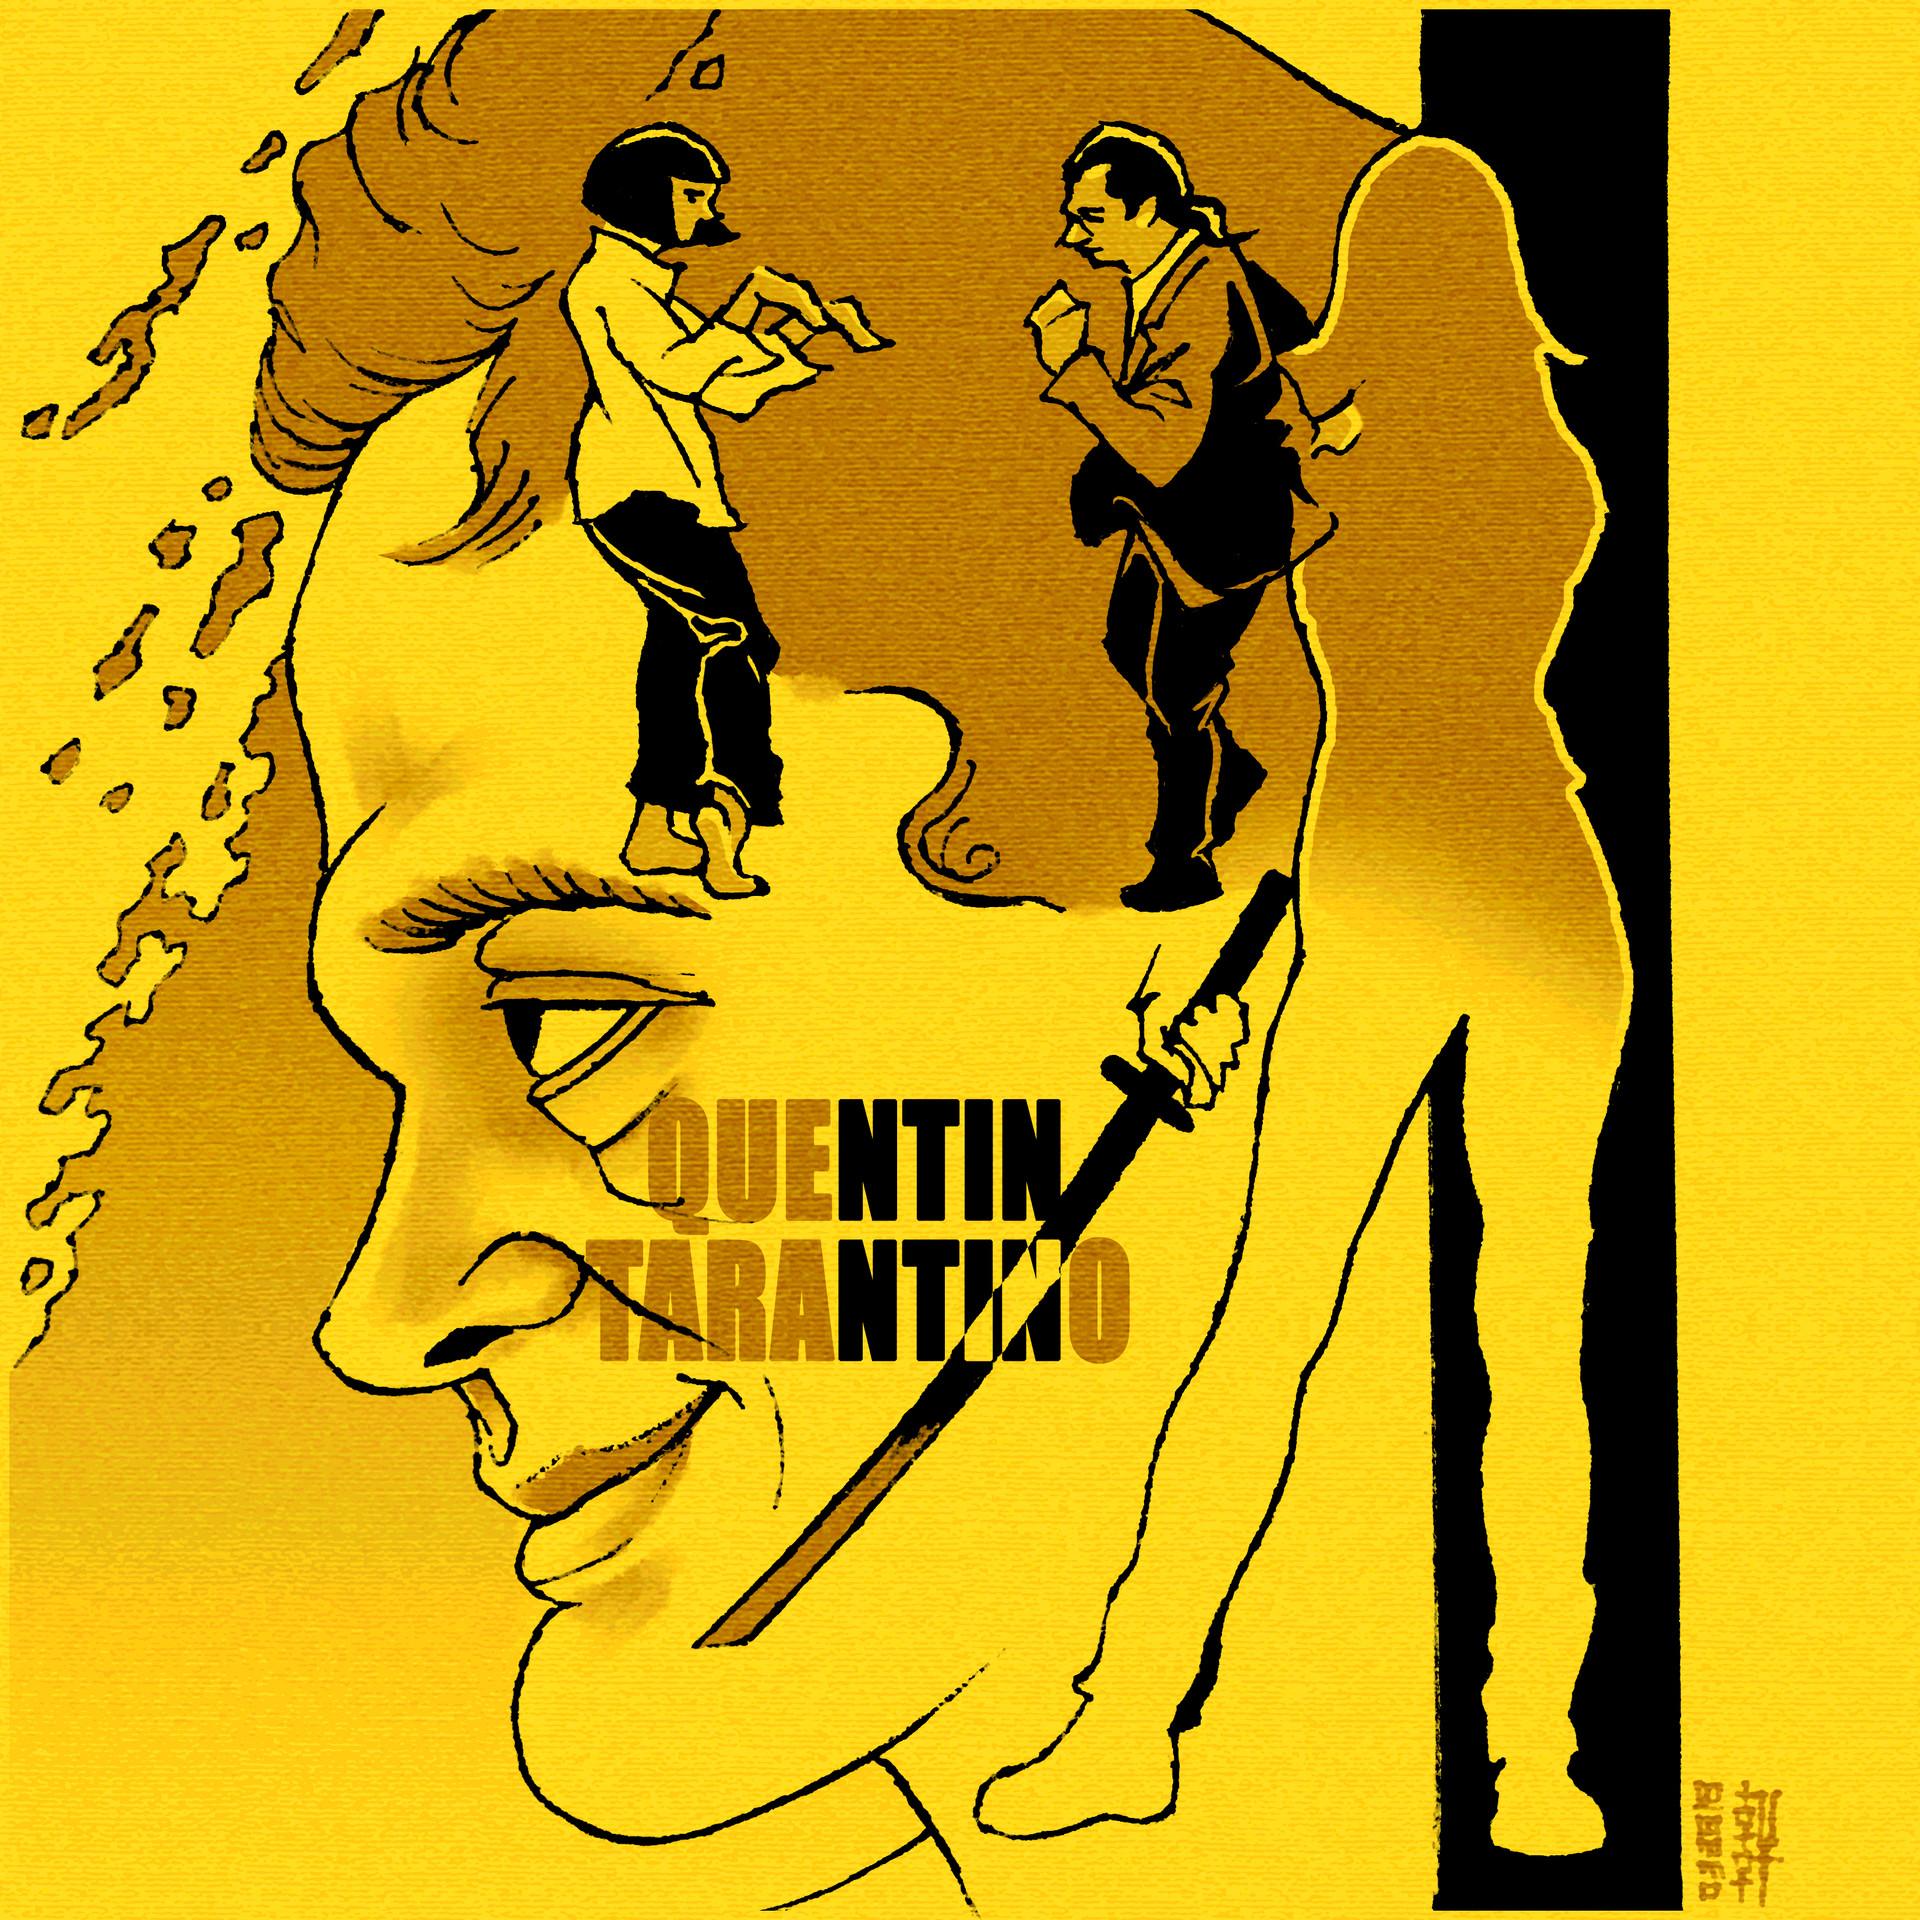 Day 03-27-18 - Quentin Tarantino